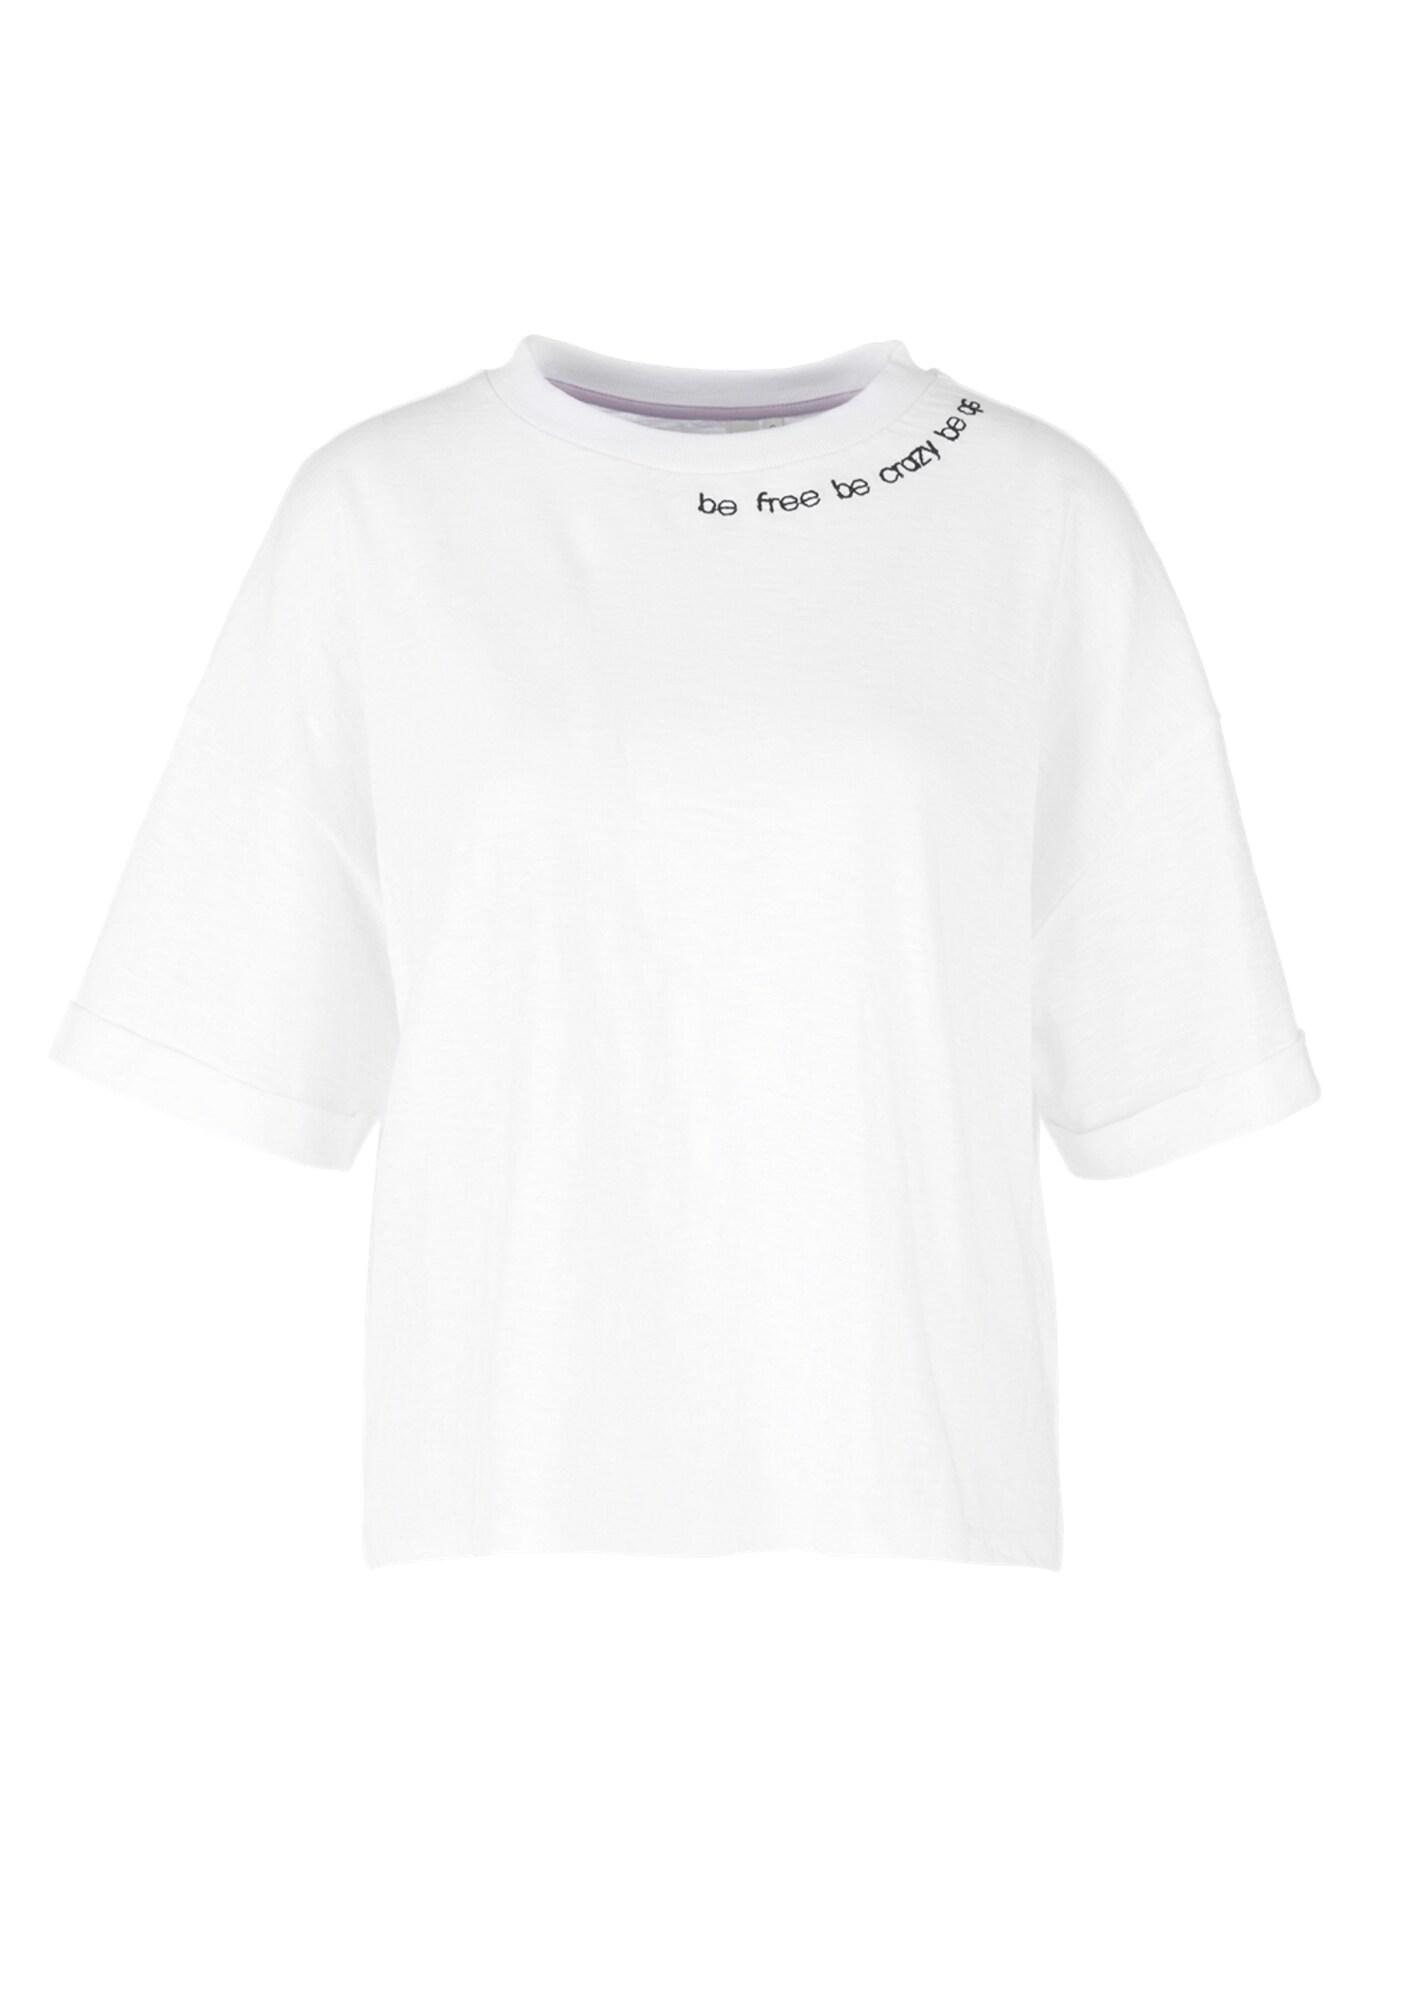 Lässiges Oversized-Printshirt   Bekleidung > Shirts > Print-Shirts   Q/S Designed By